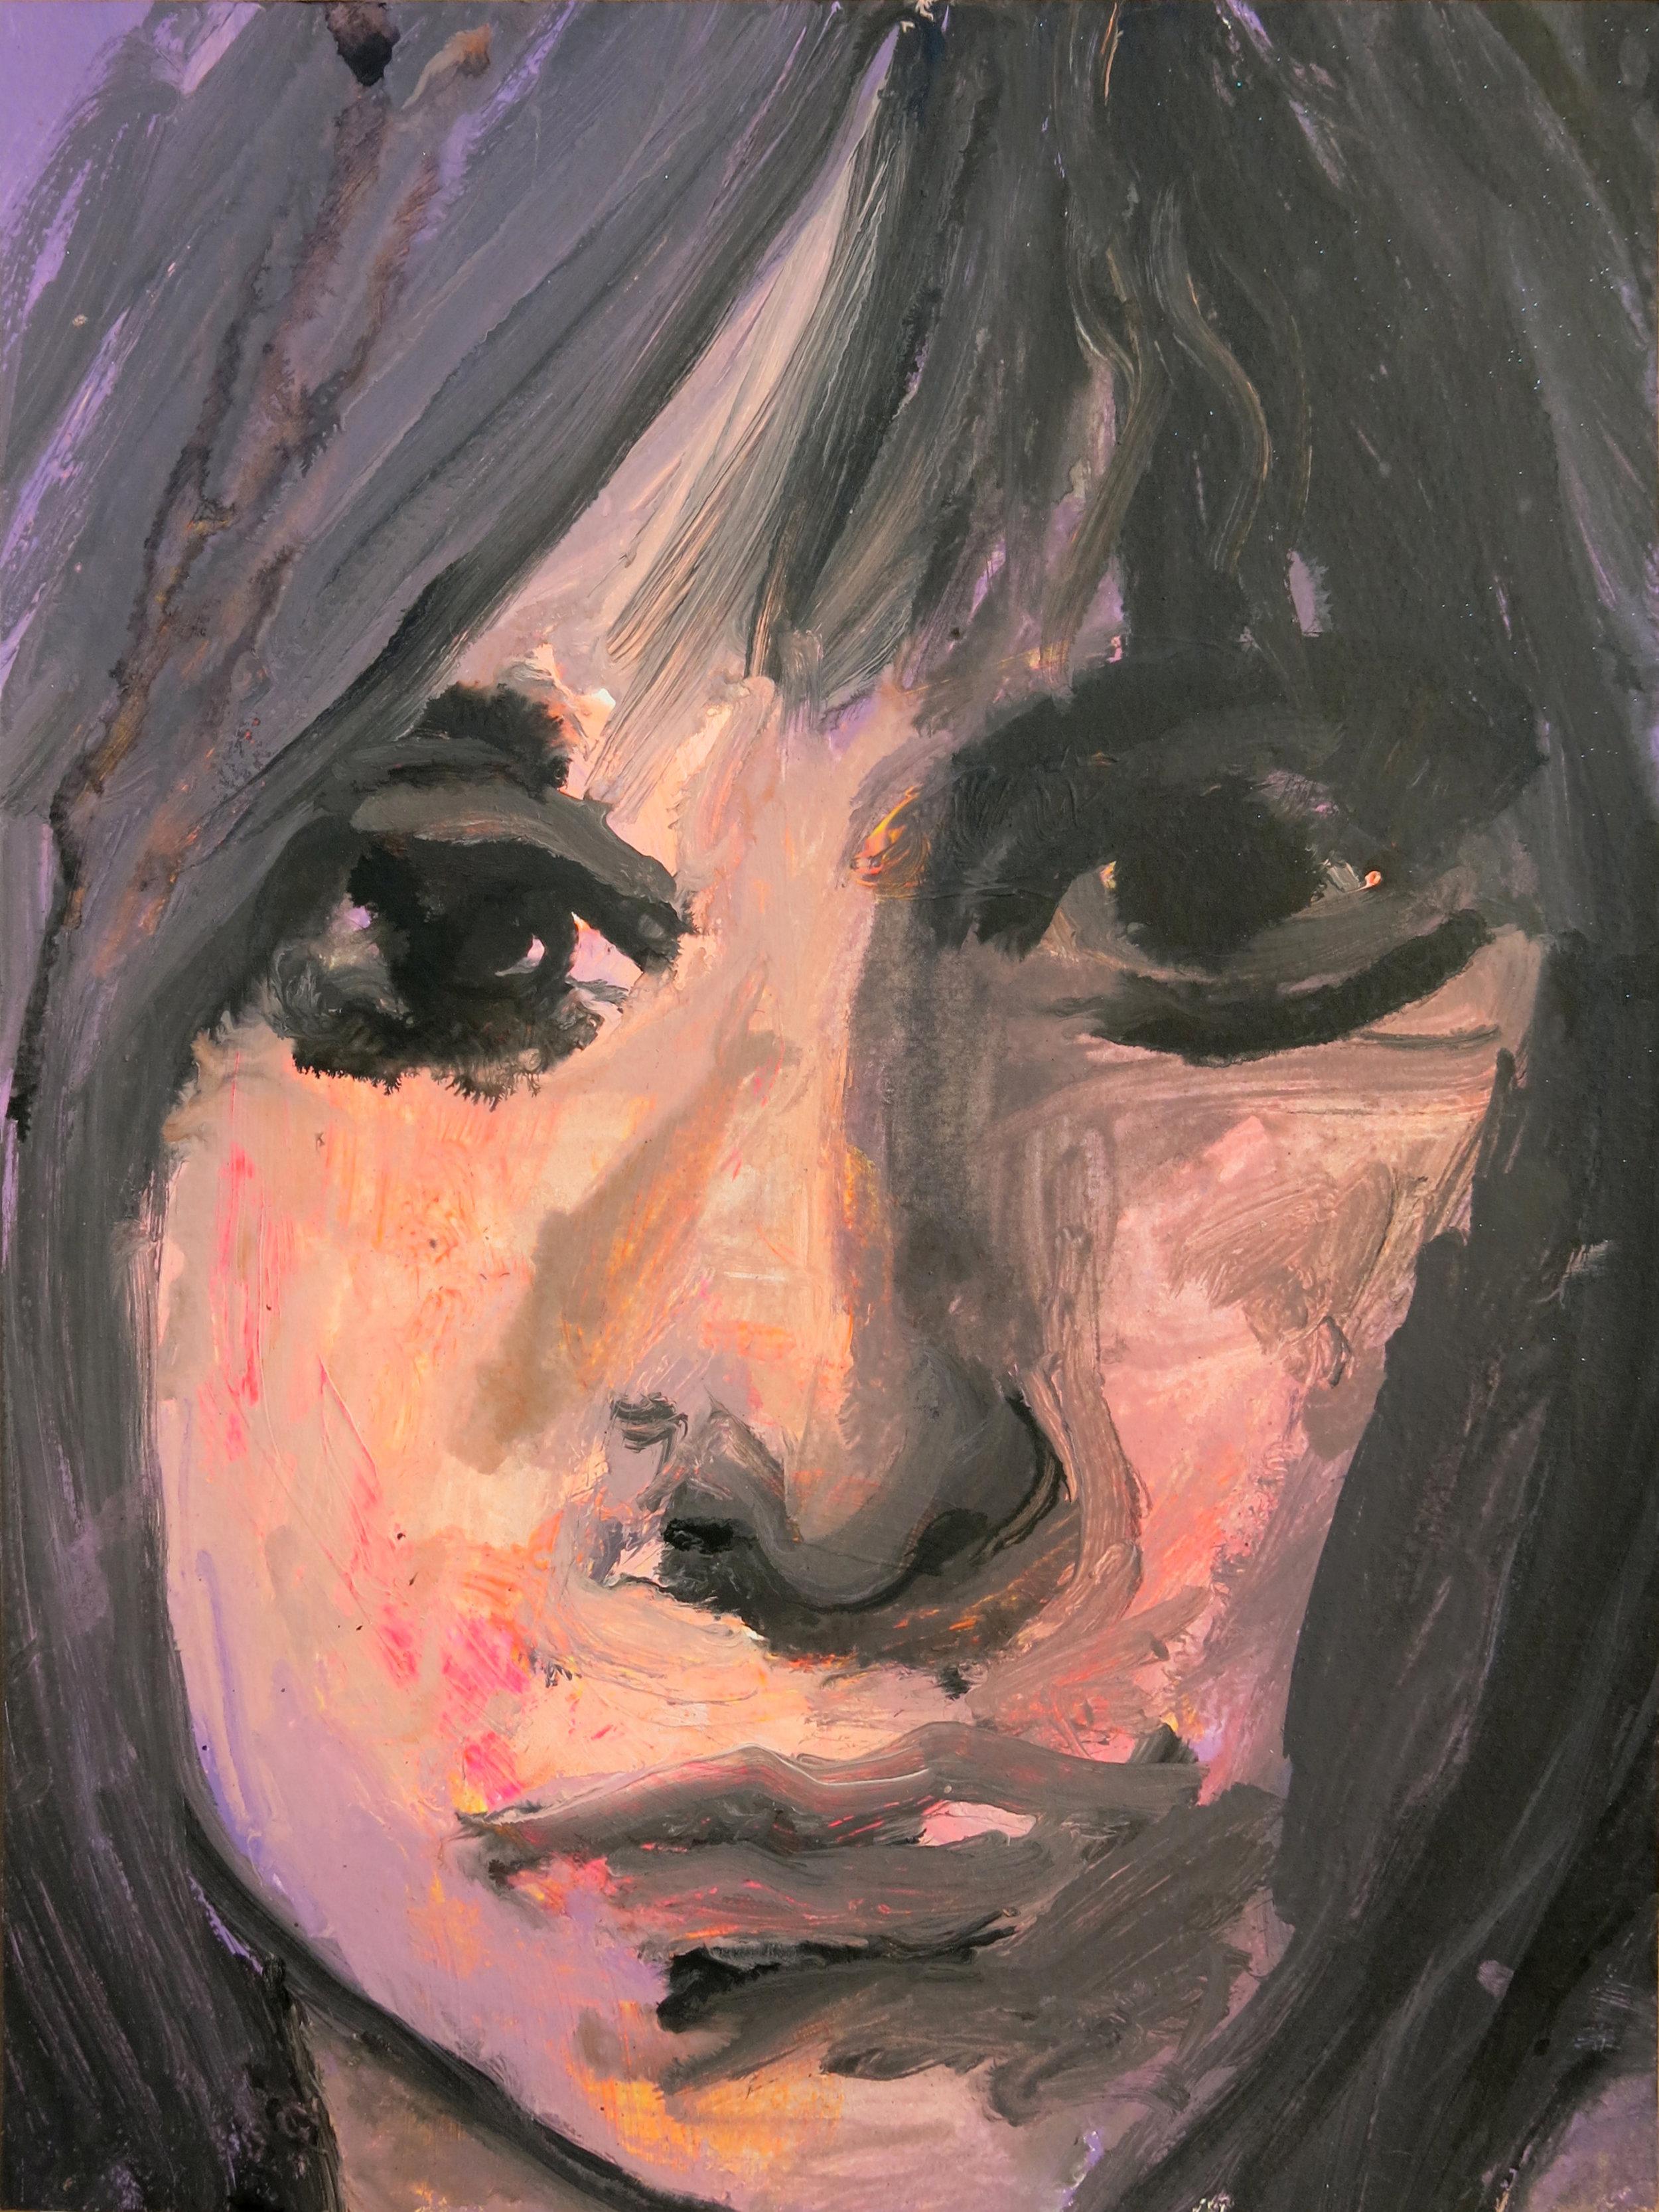 Barbra Streisand Portrait #30